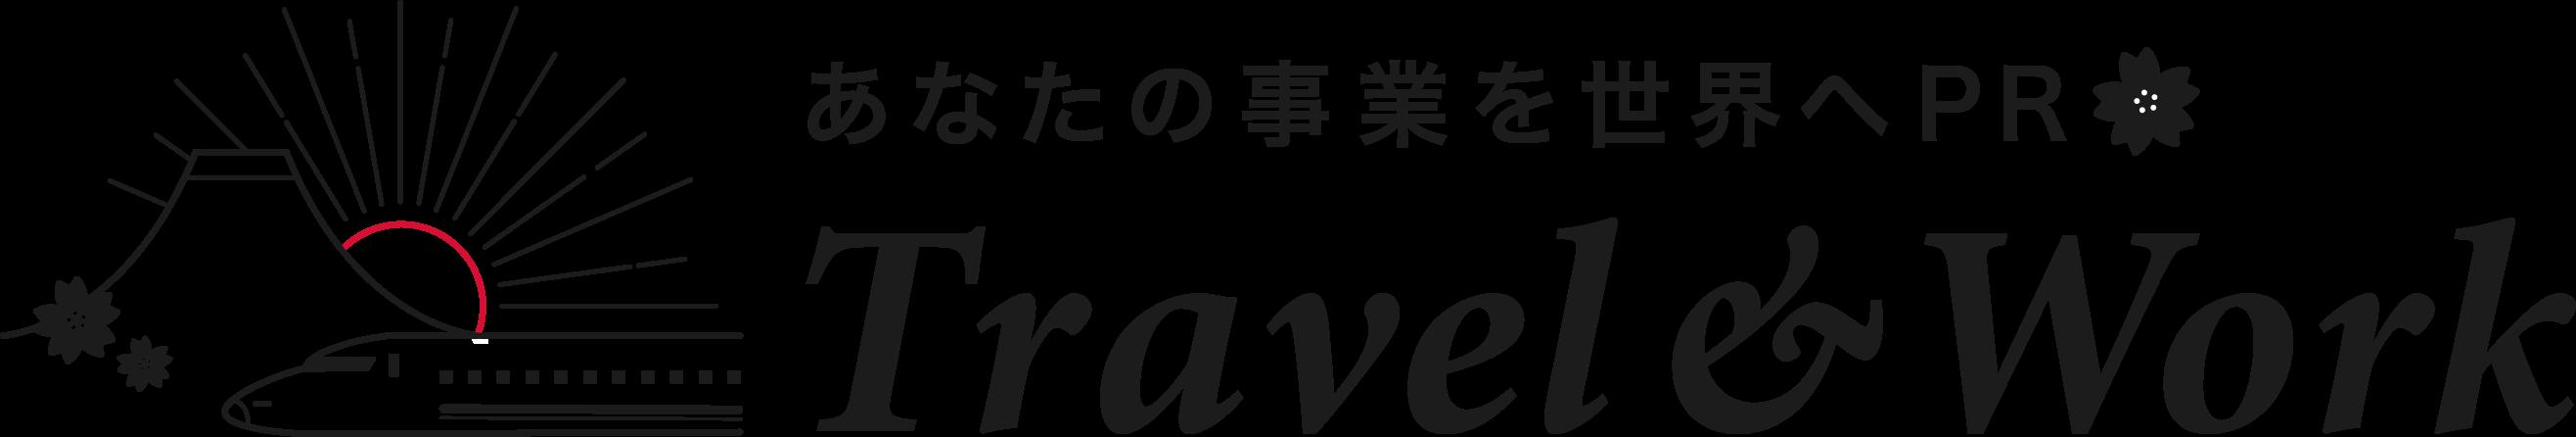 Travel & Work-あなたの事業を世界へPR